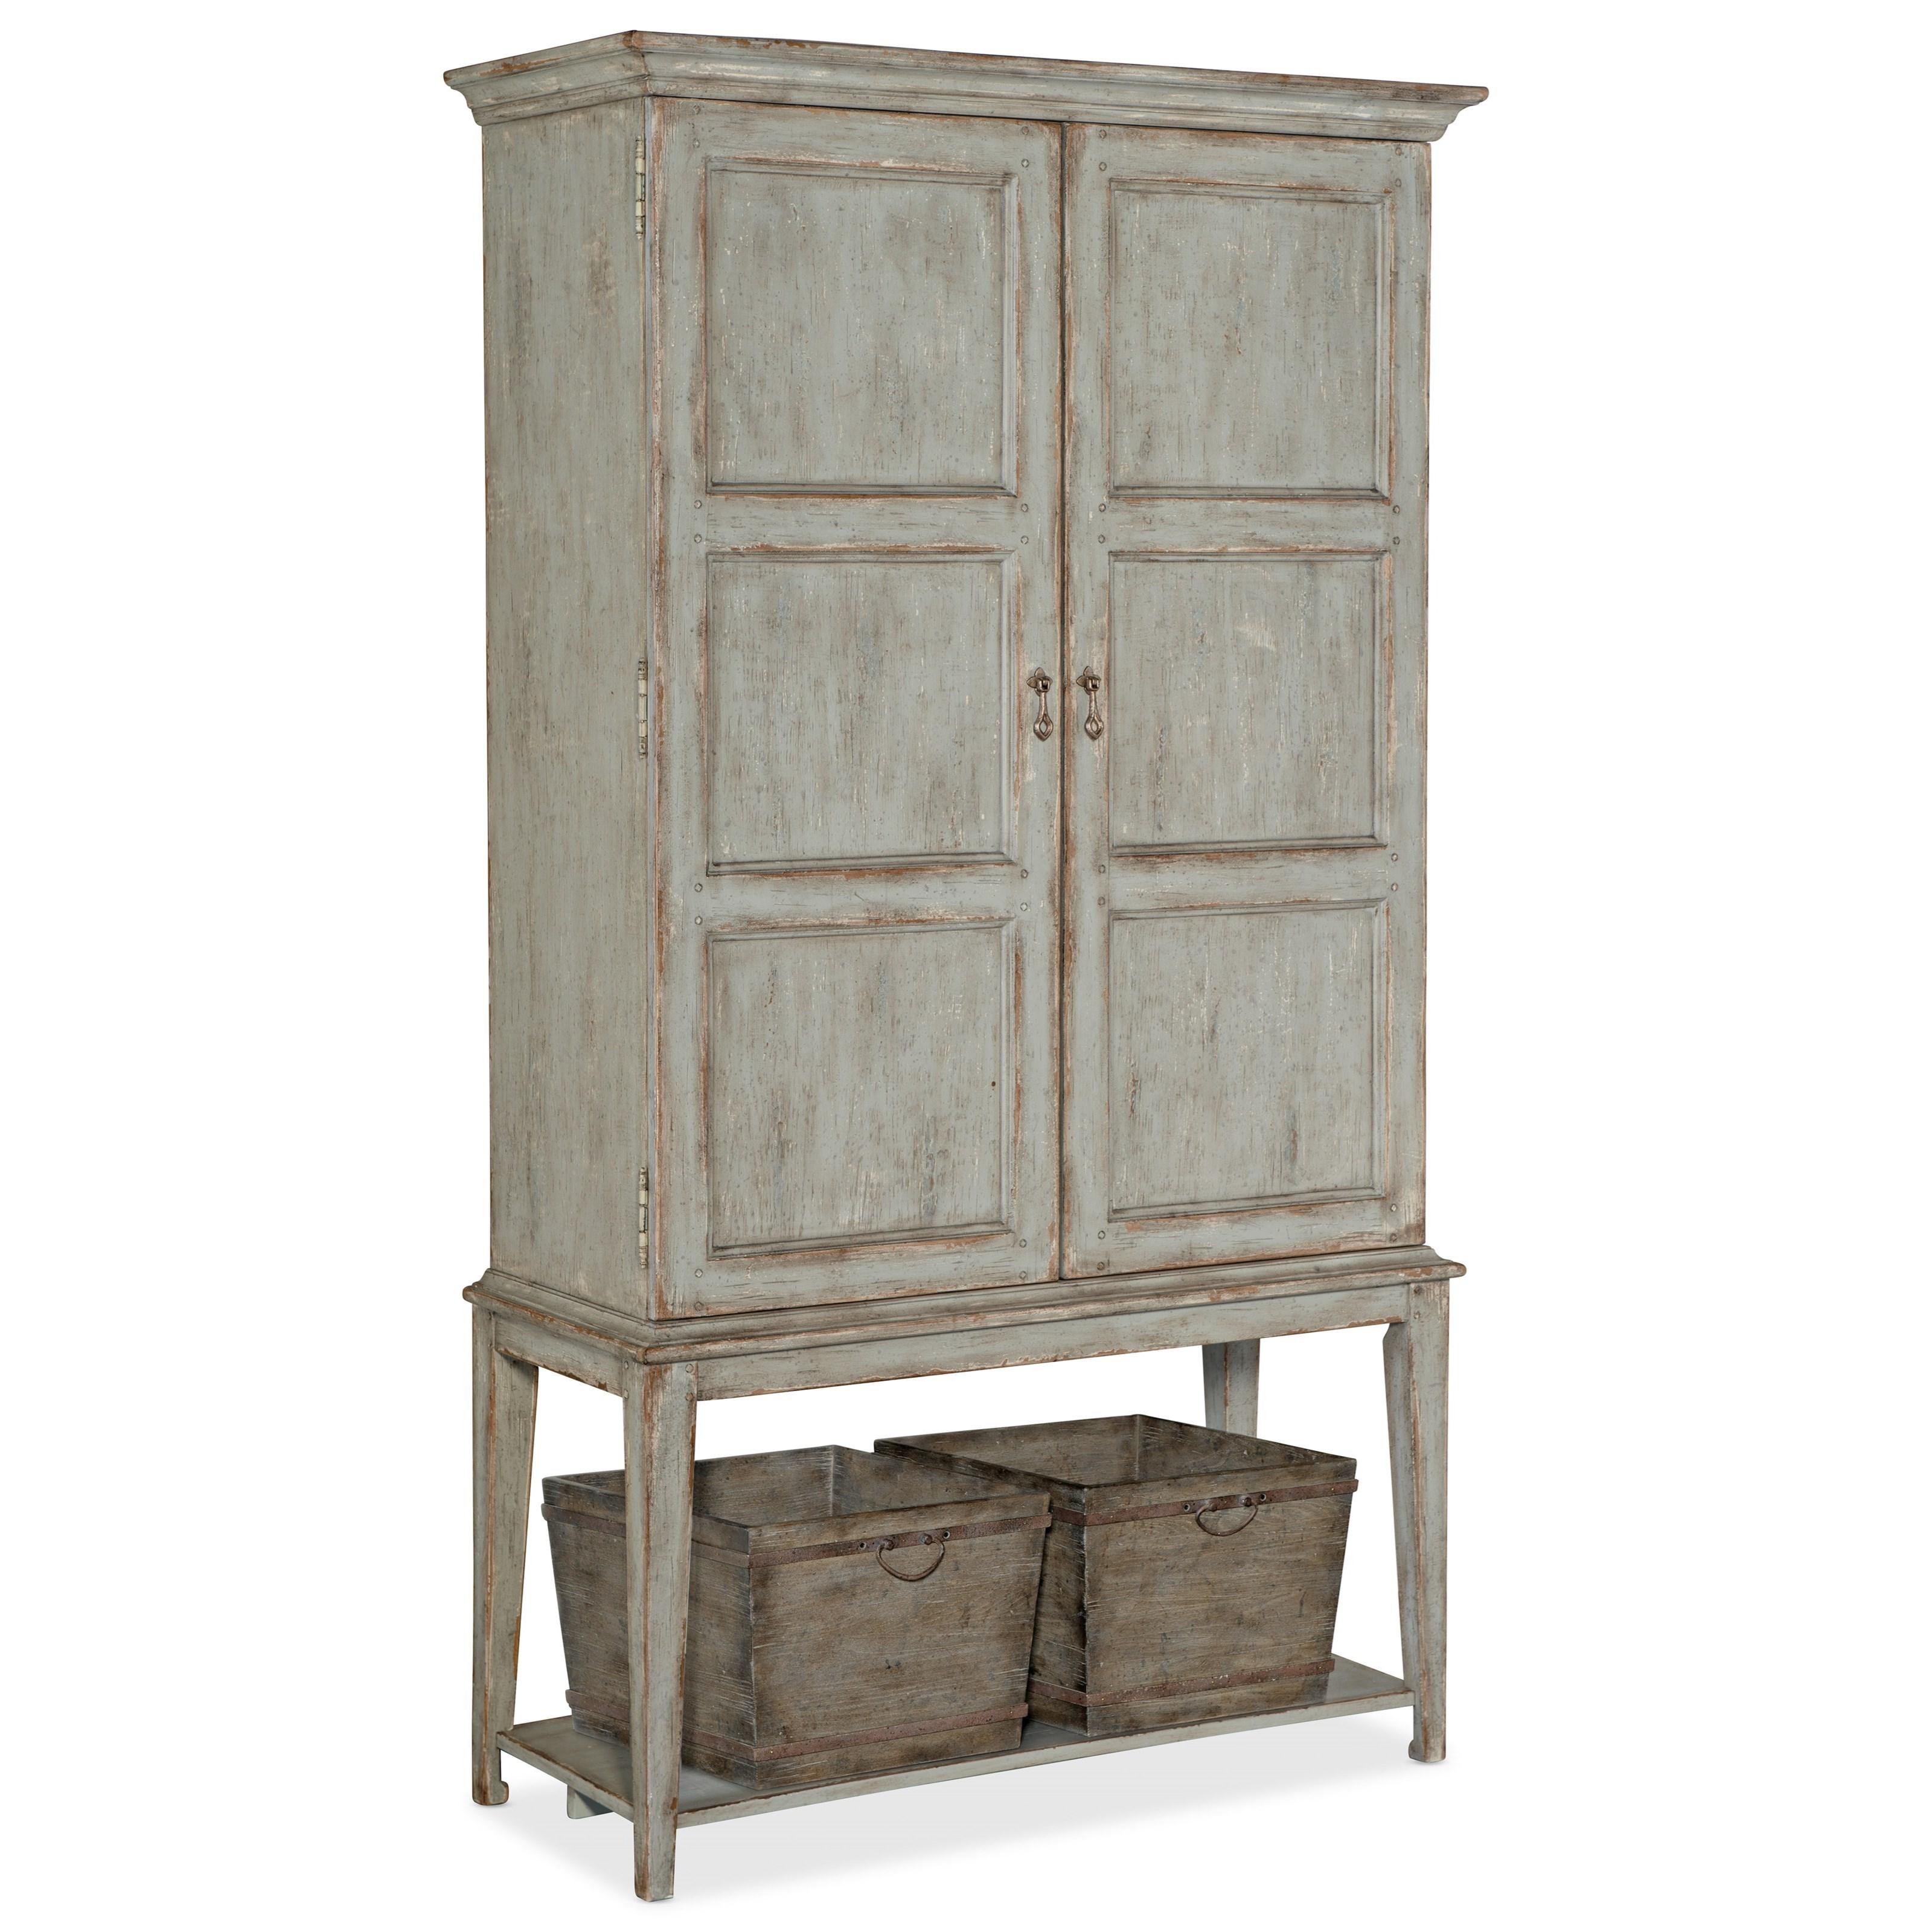 Alfresco Vino della Vita Vintners Cabinet by Hooker Furniture at Miller Waldrop Furniture and Decor